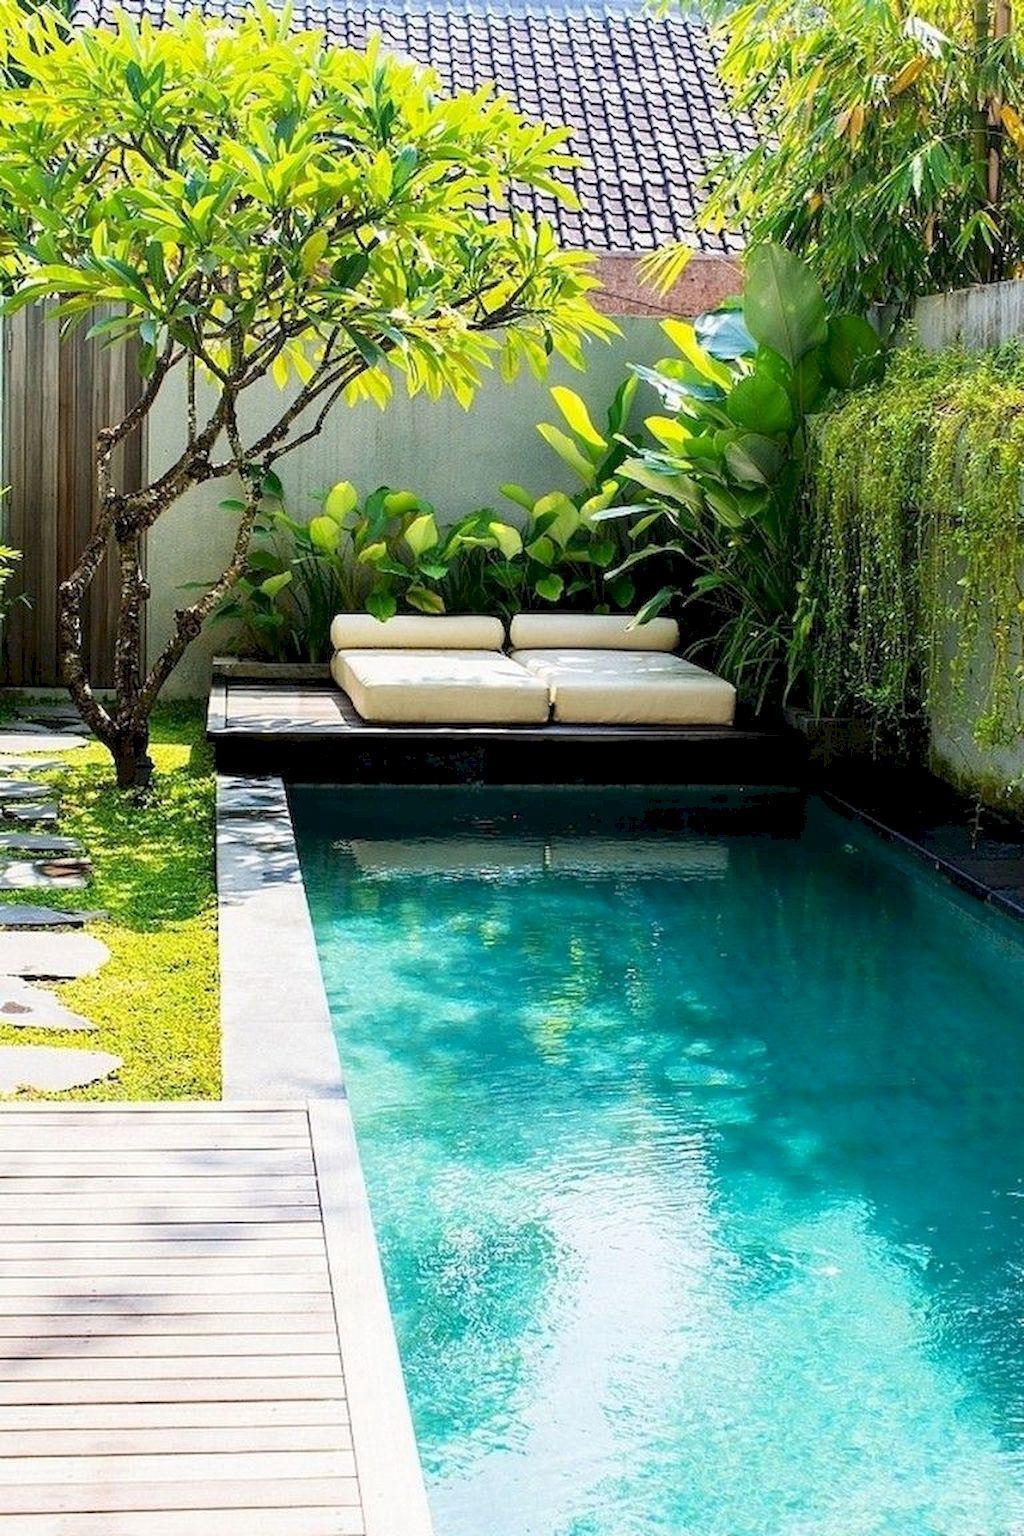 85 small backyard swimming pool ideas and design on layouts and landscaping small backyards ideas id=66312